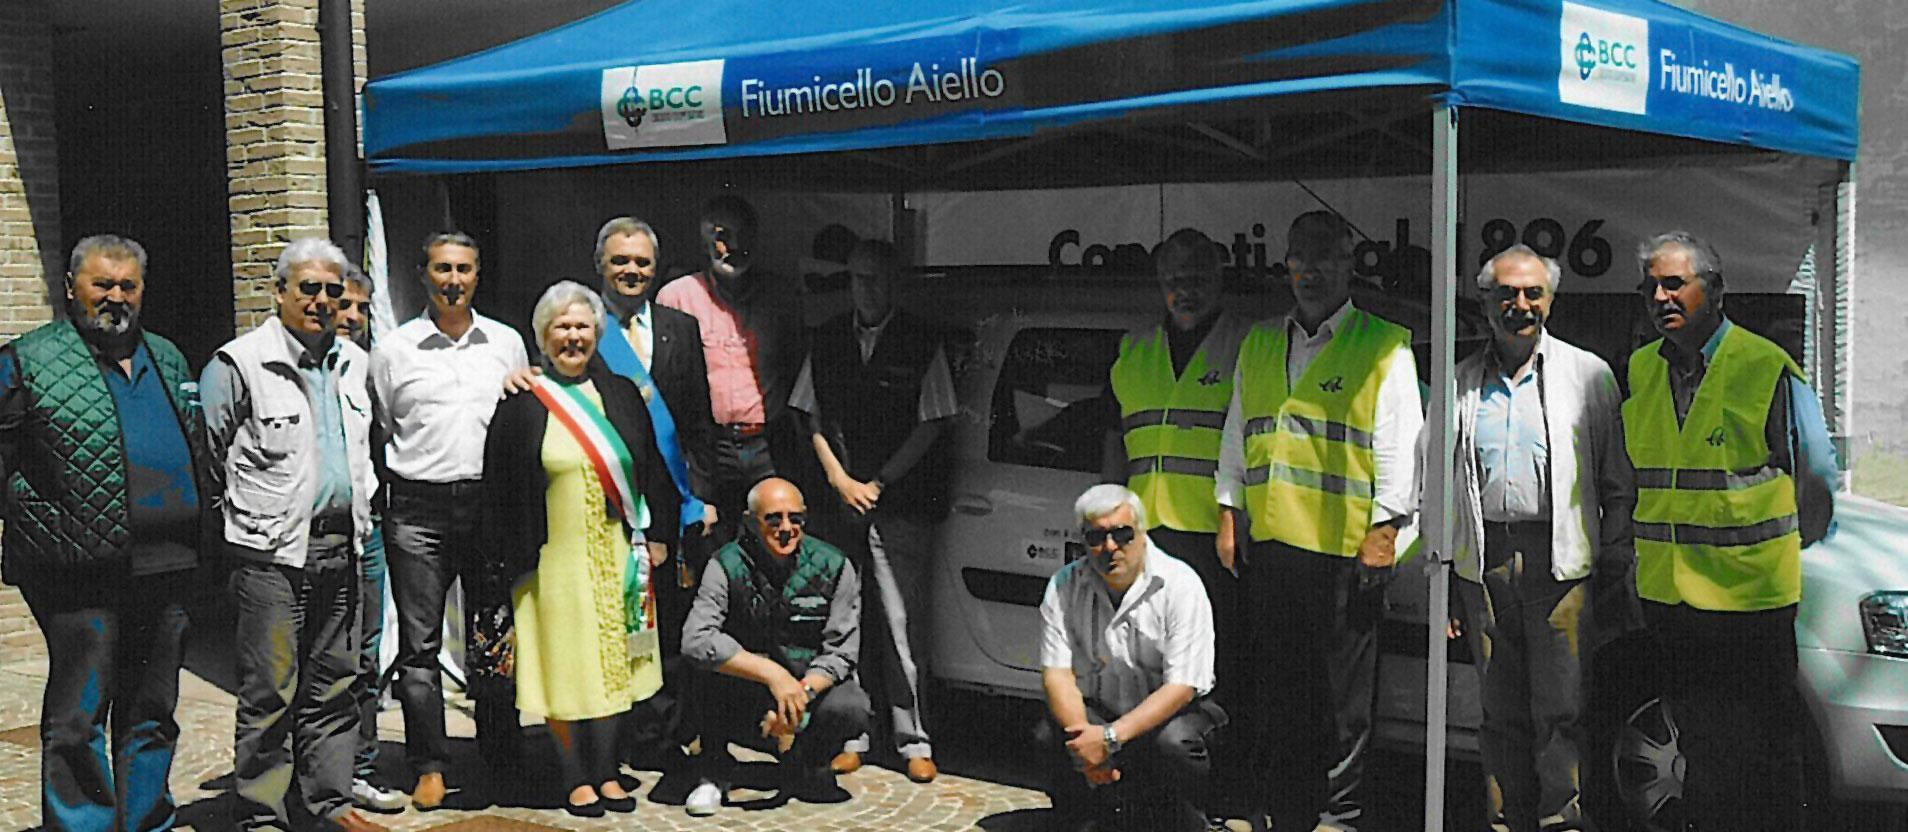 Some volunteers Anteas Friuli